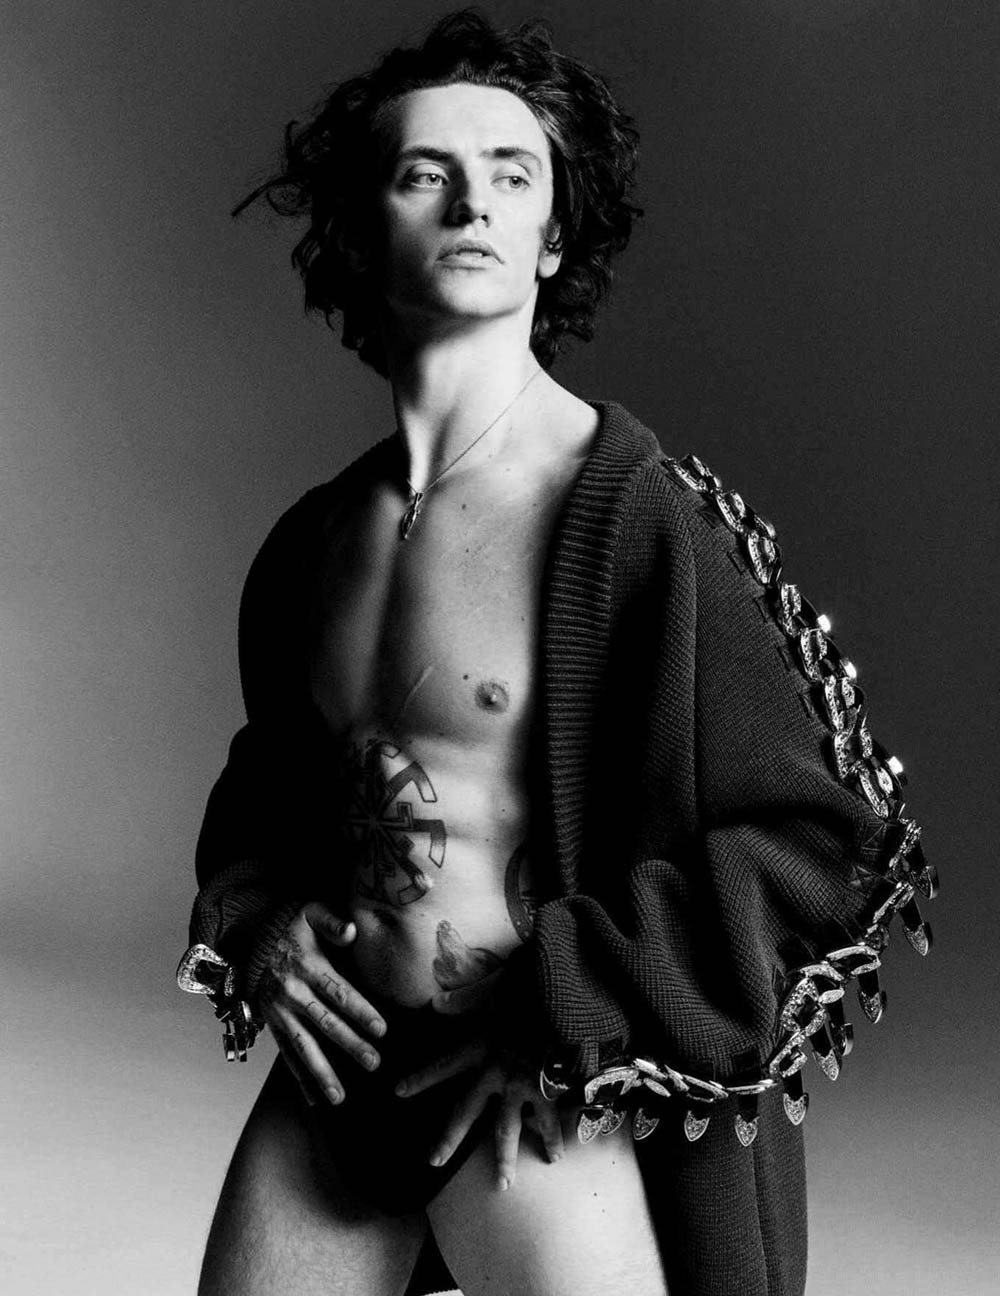 Fran Summers and Sergei Polunin by Luigi & Iango for Vogue Germany July 2018